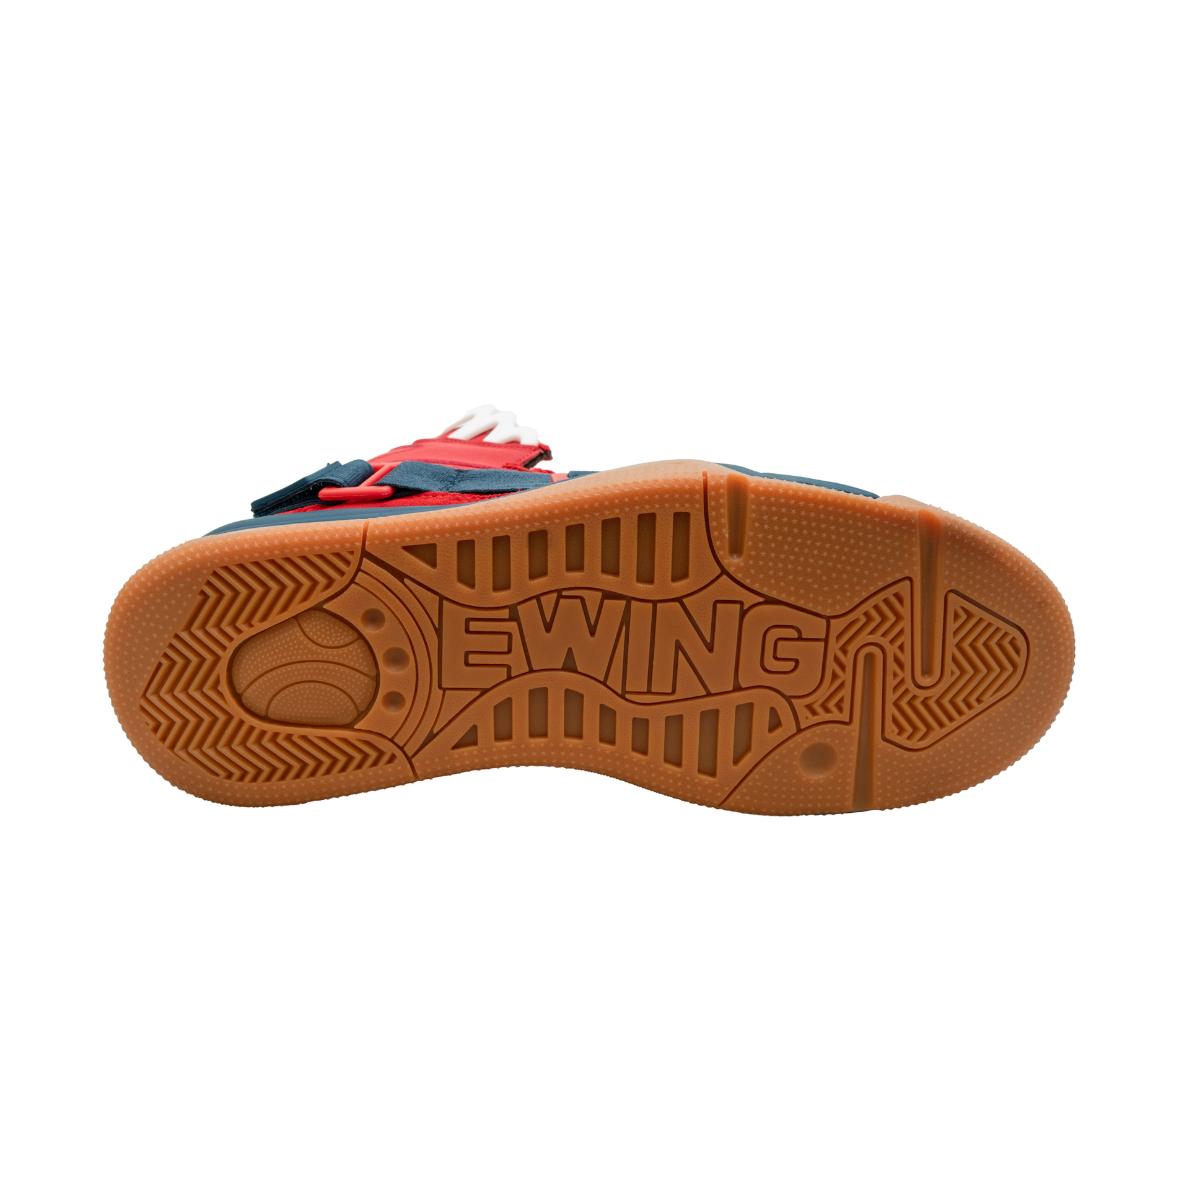 Sean Price x Ewing Athletics Sneaker Collab